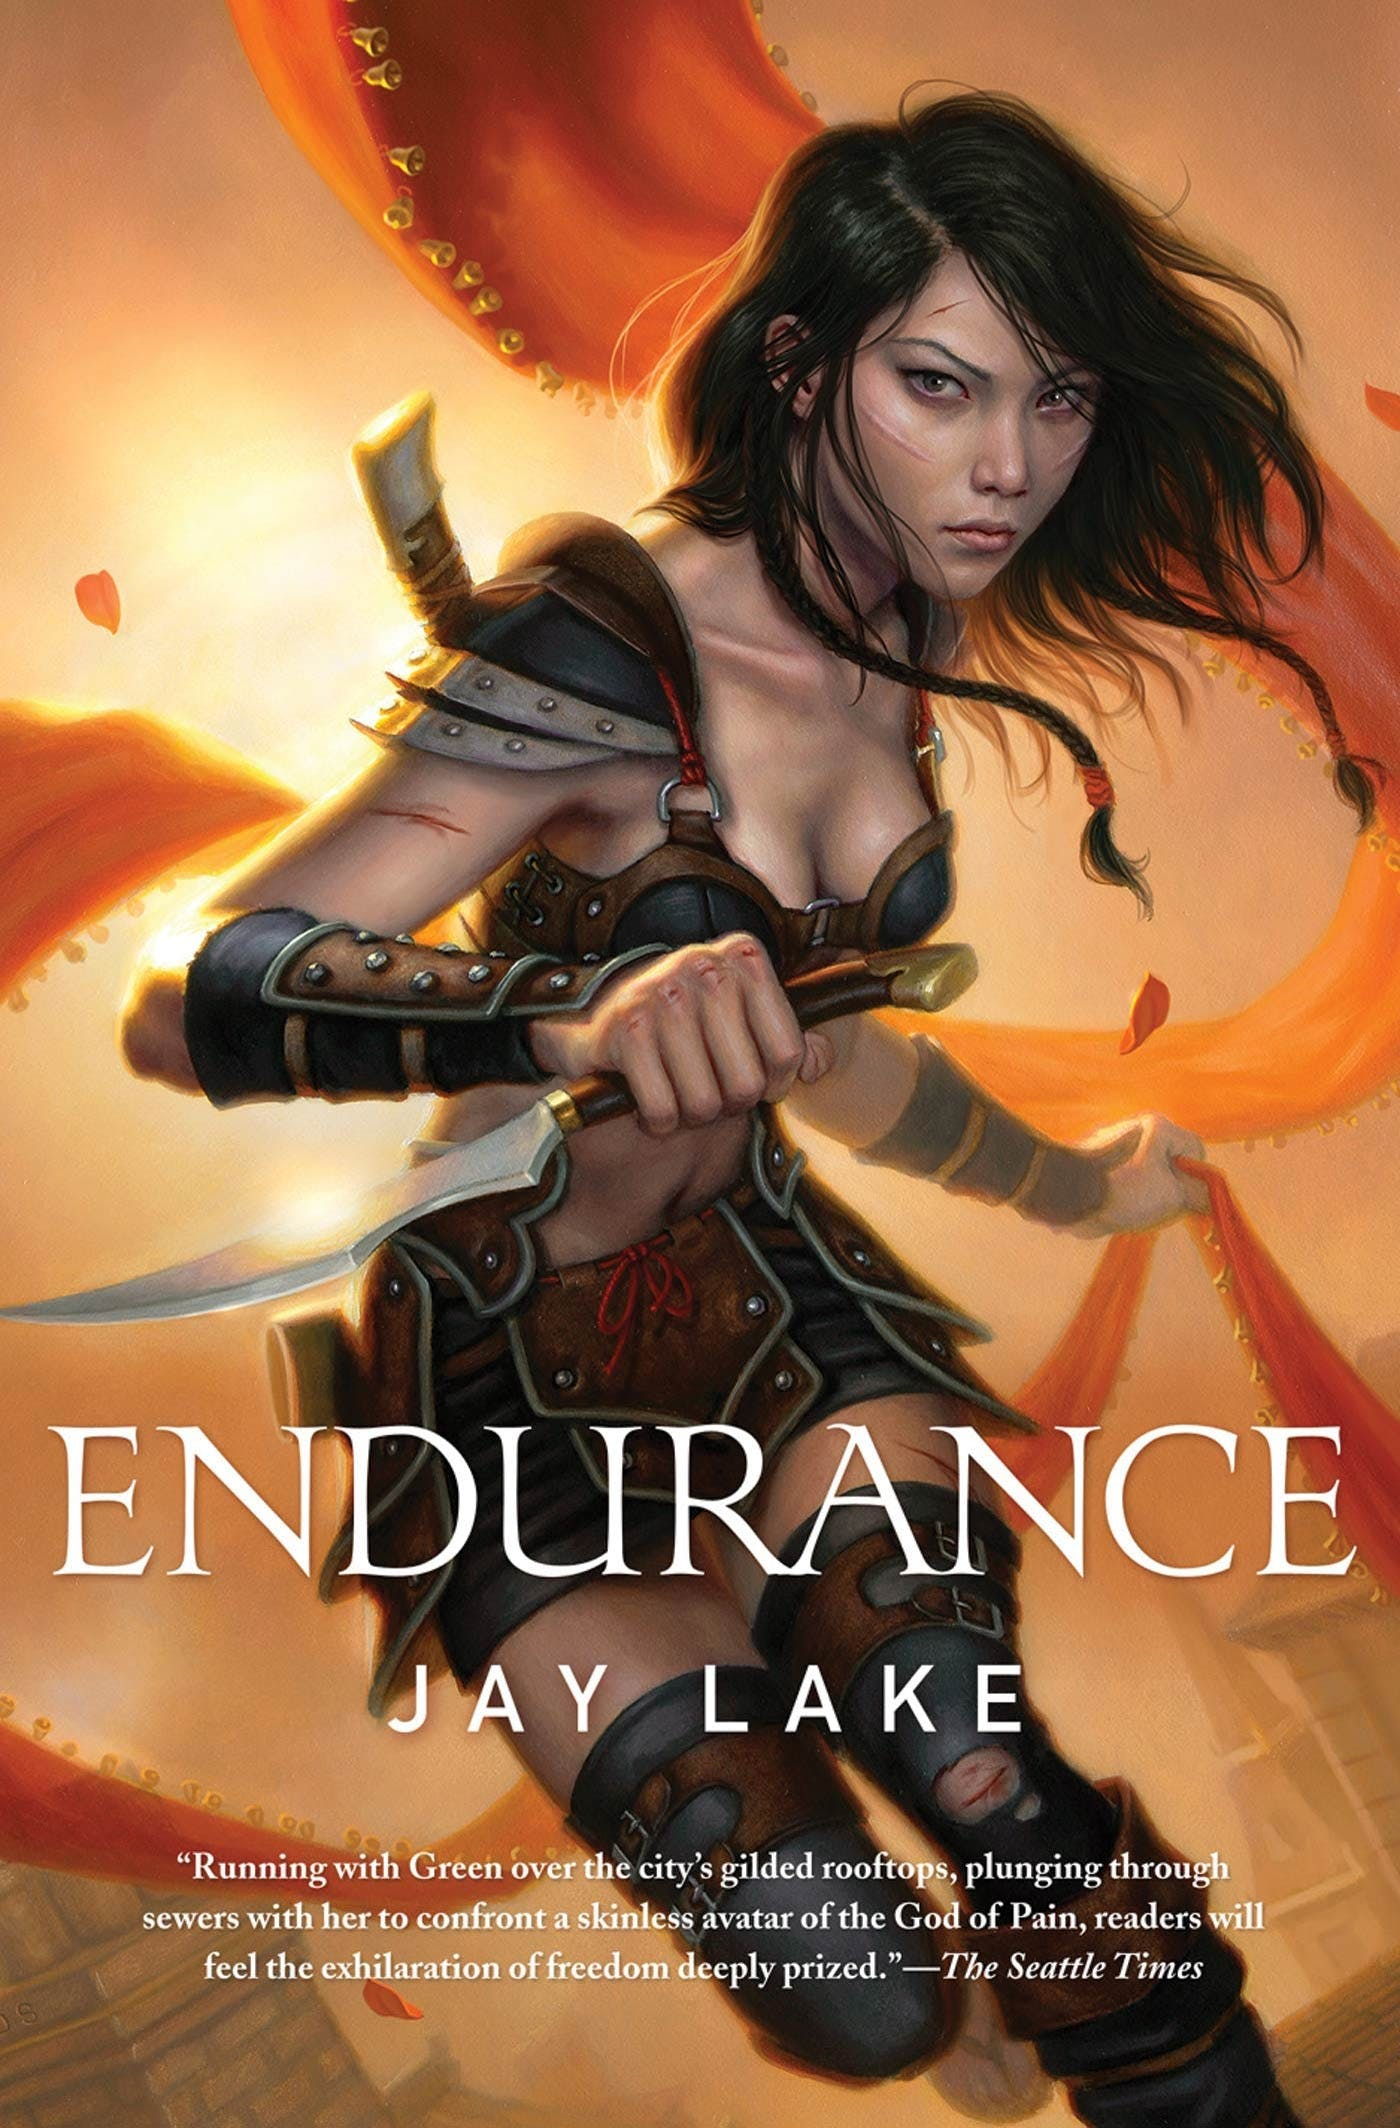 Image of Endurance